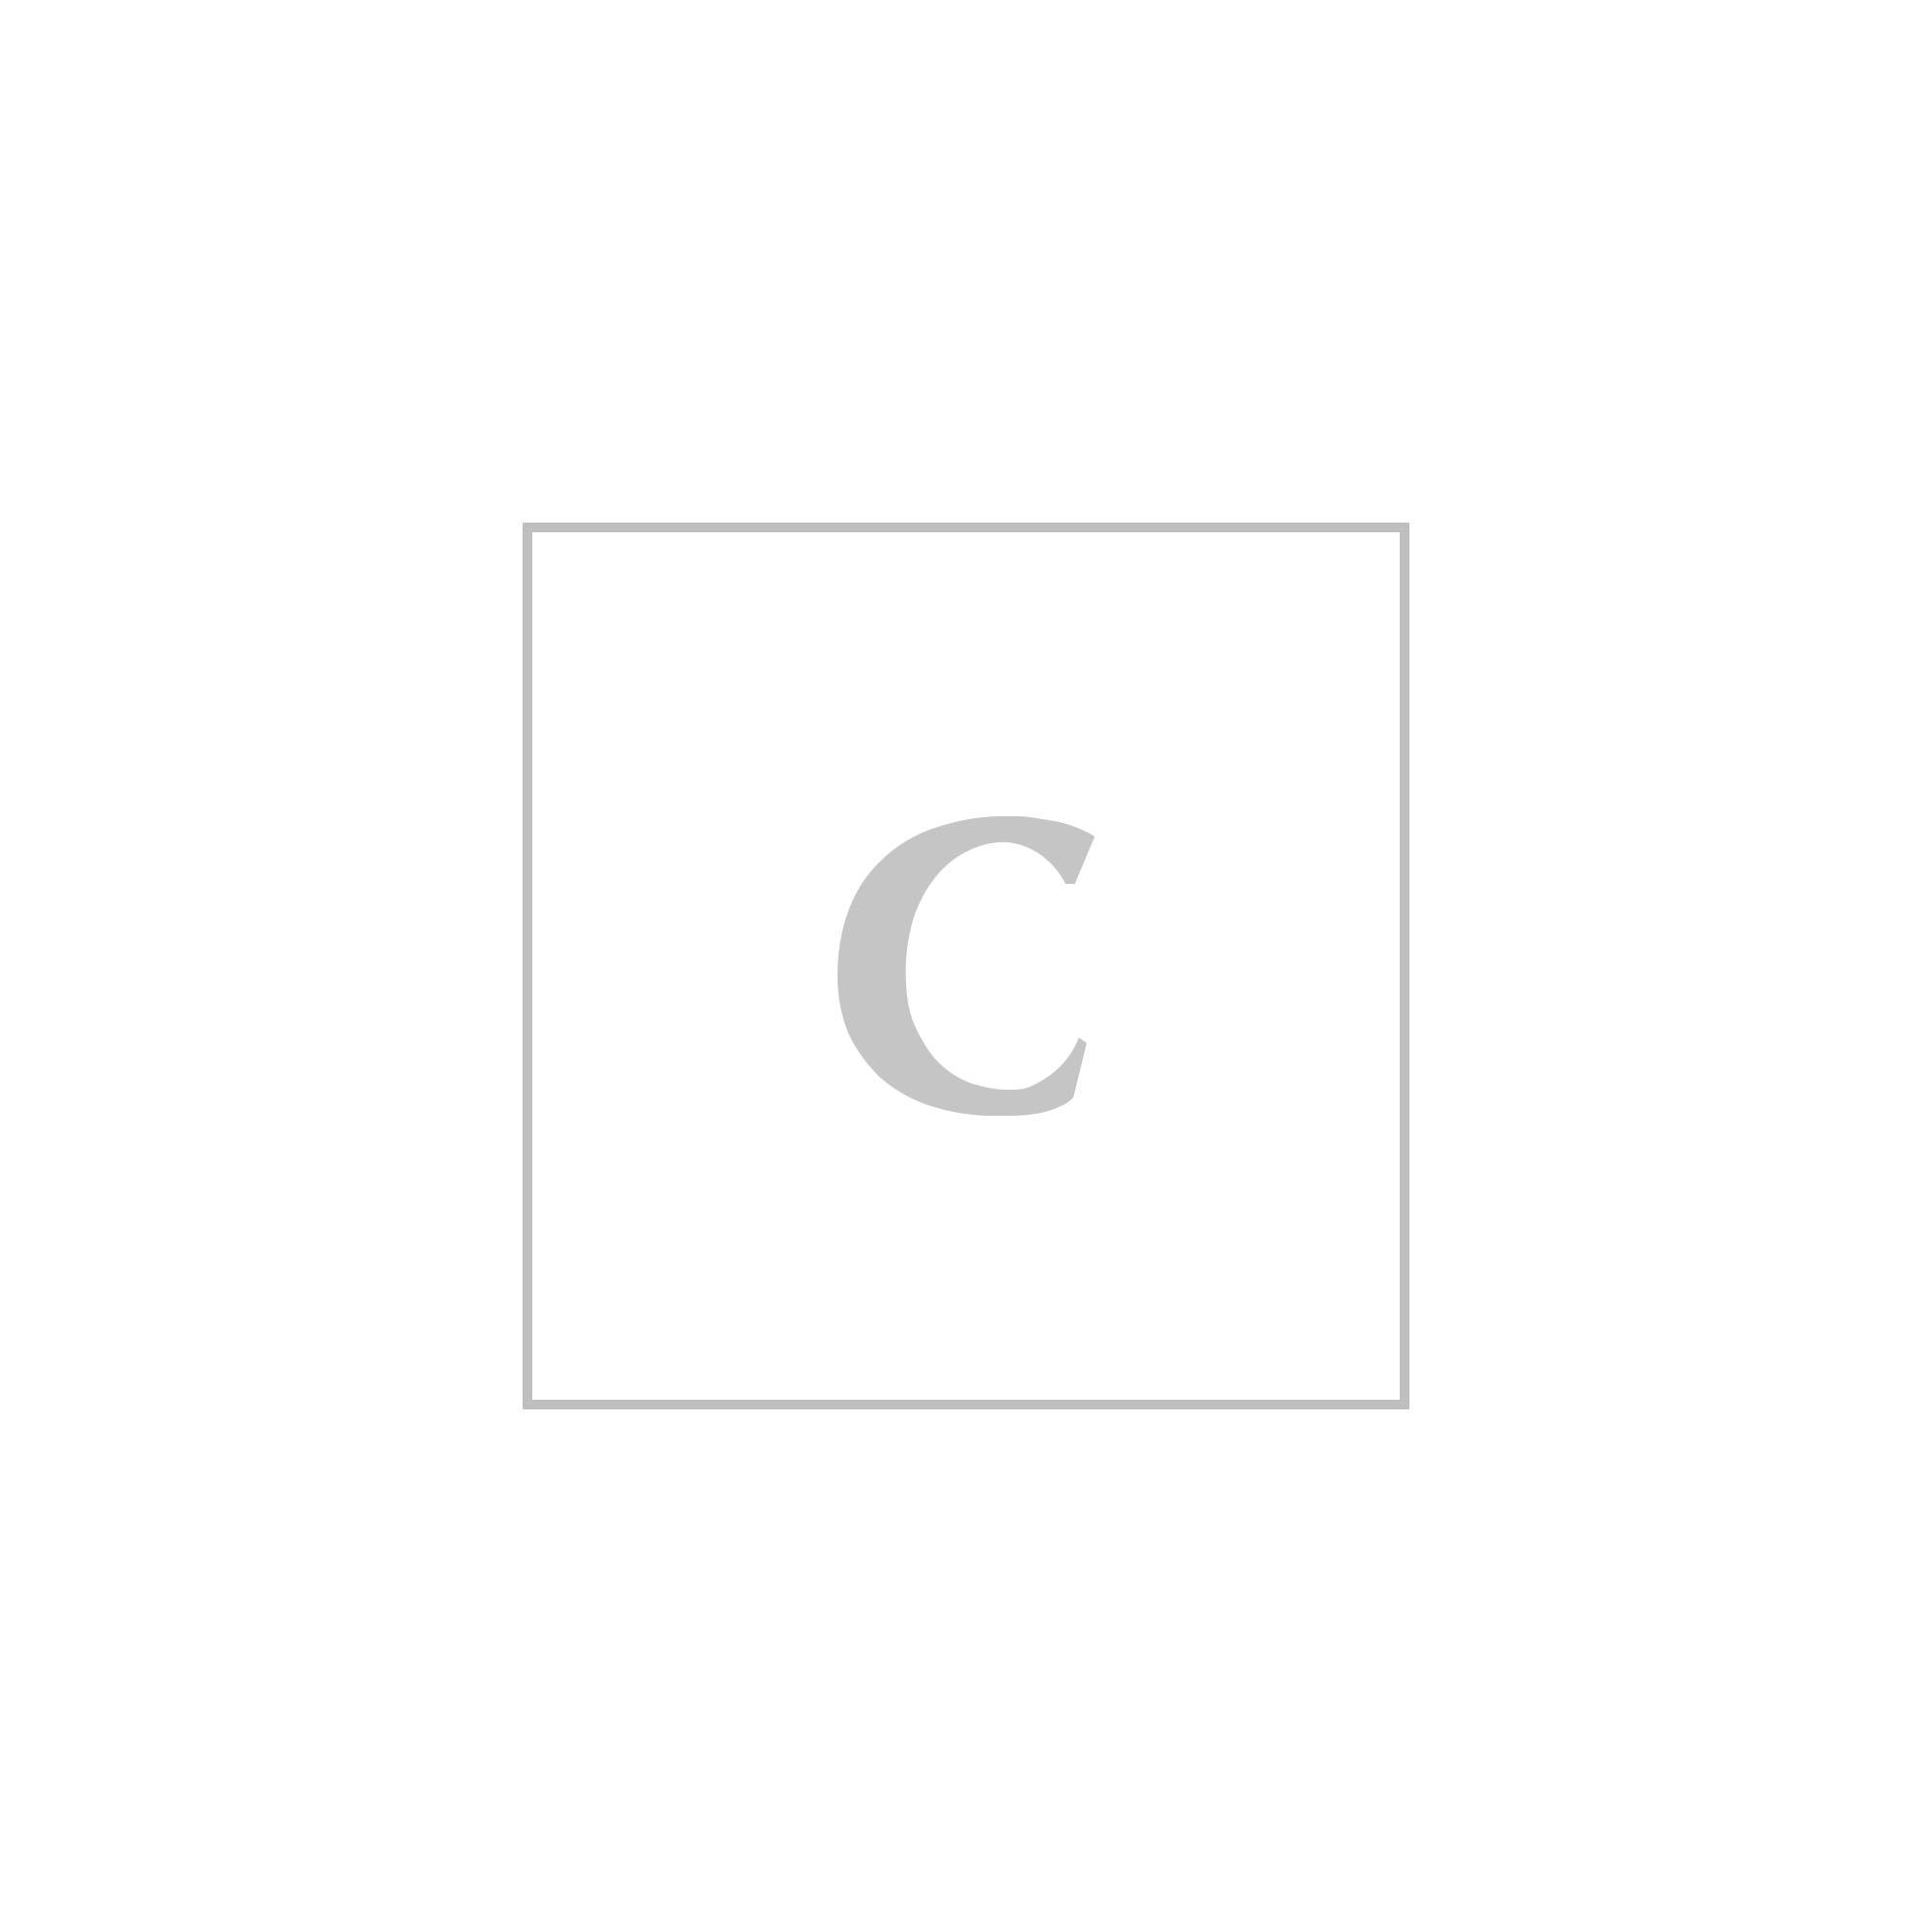 4a4e4be5f4cd Women Calvin Klein 205w39nyc Sweaters Rosa   Coltorti Boutique